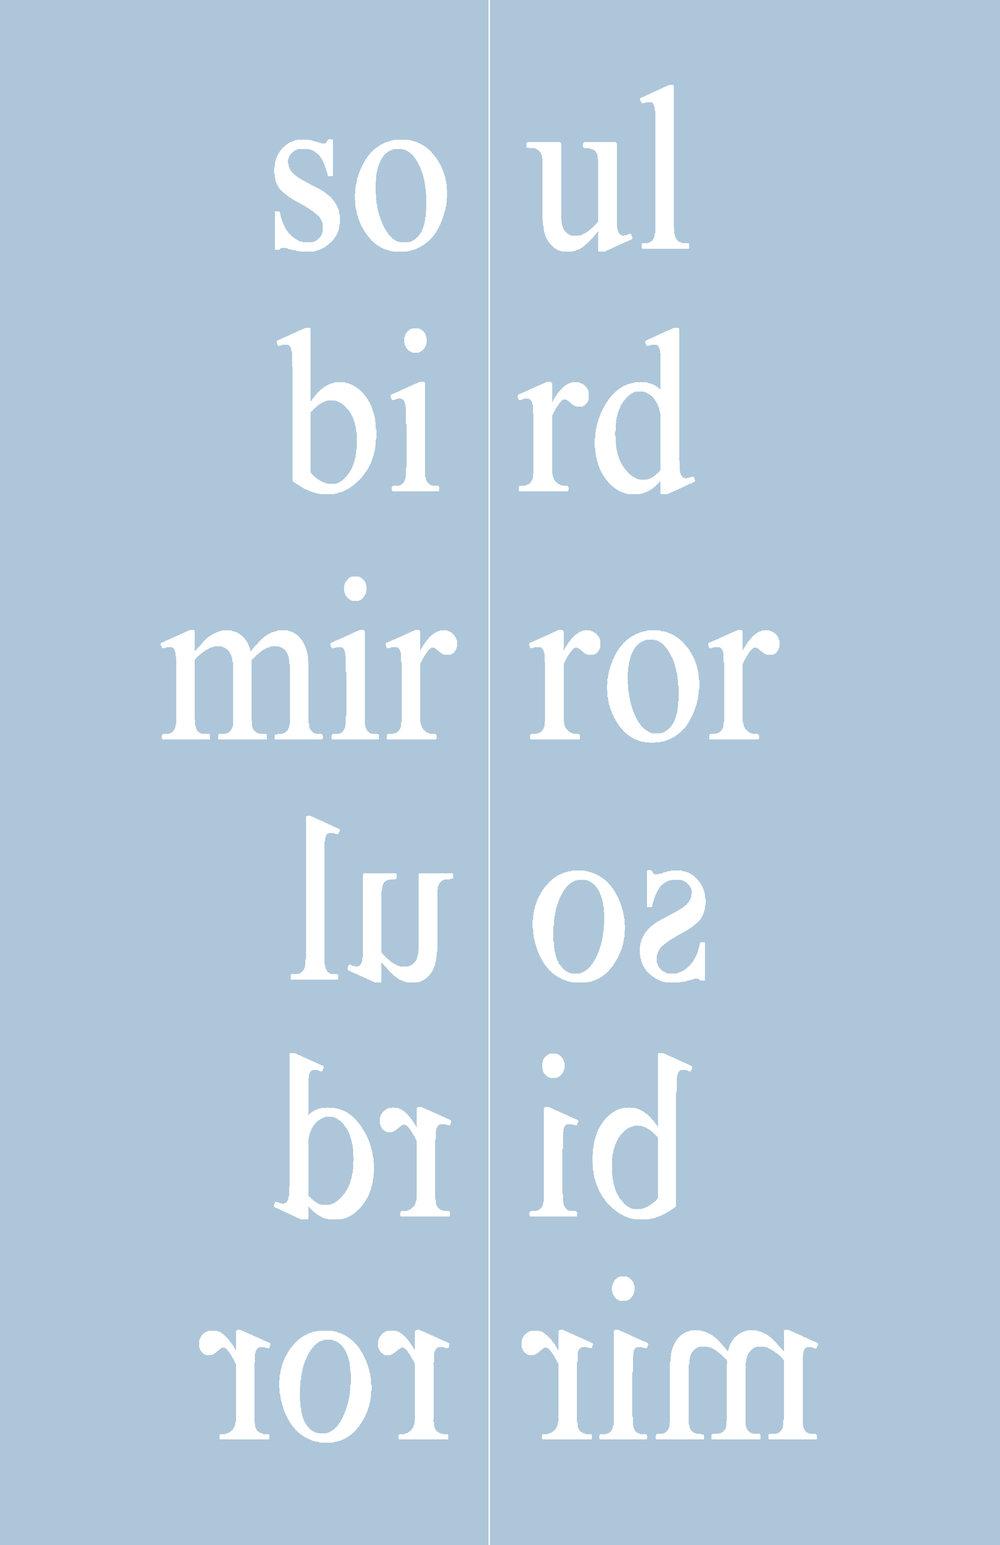 Soul Bird Mirror blue 2.jpg